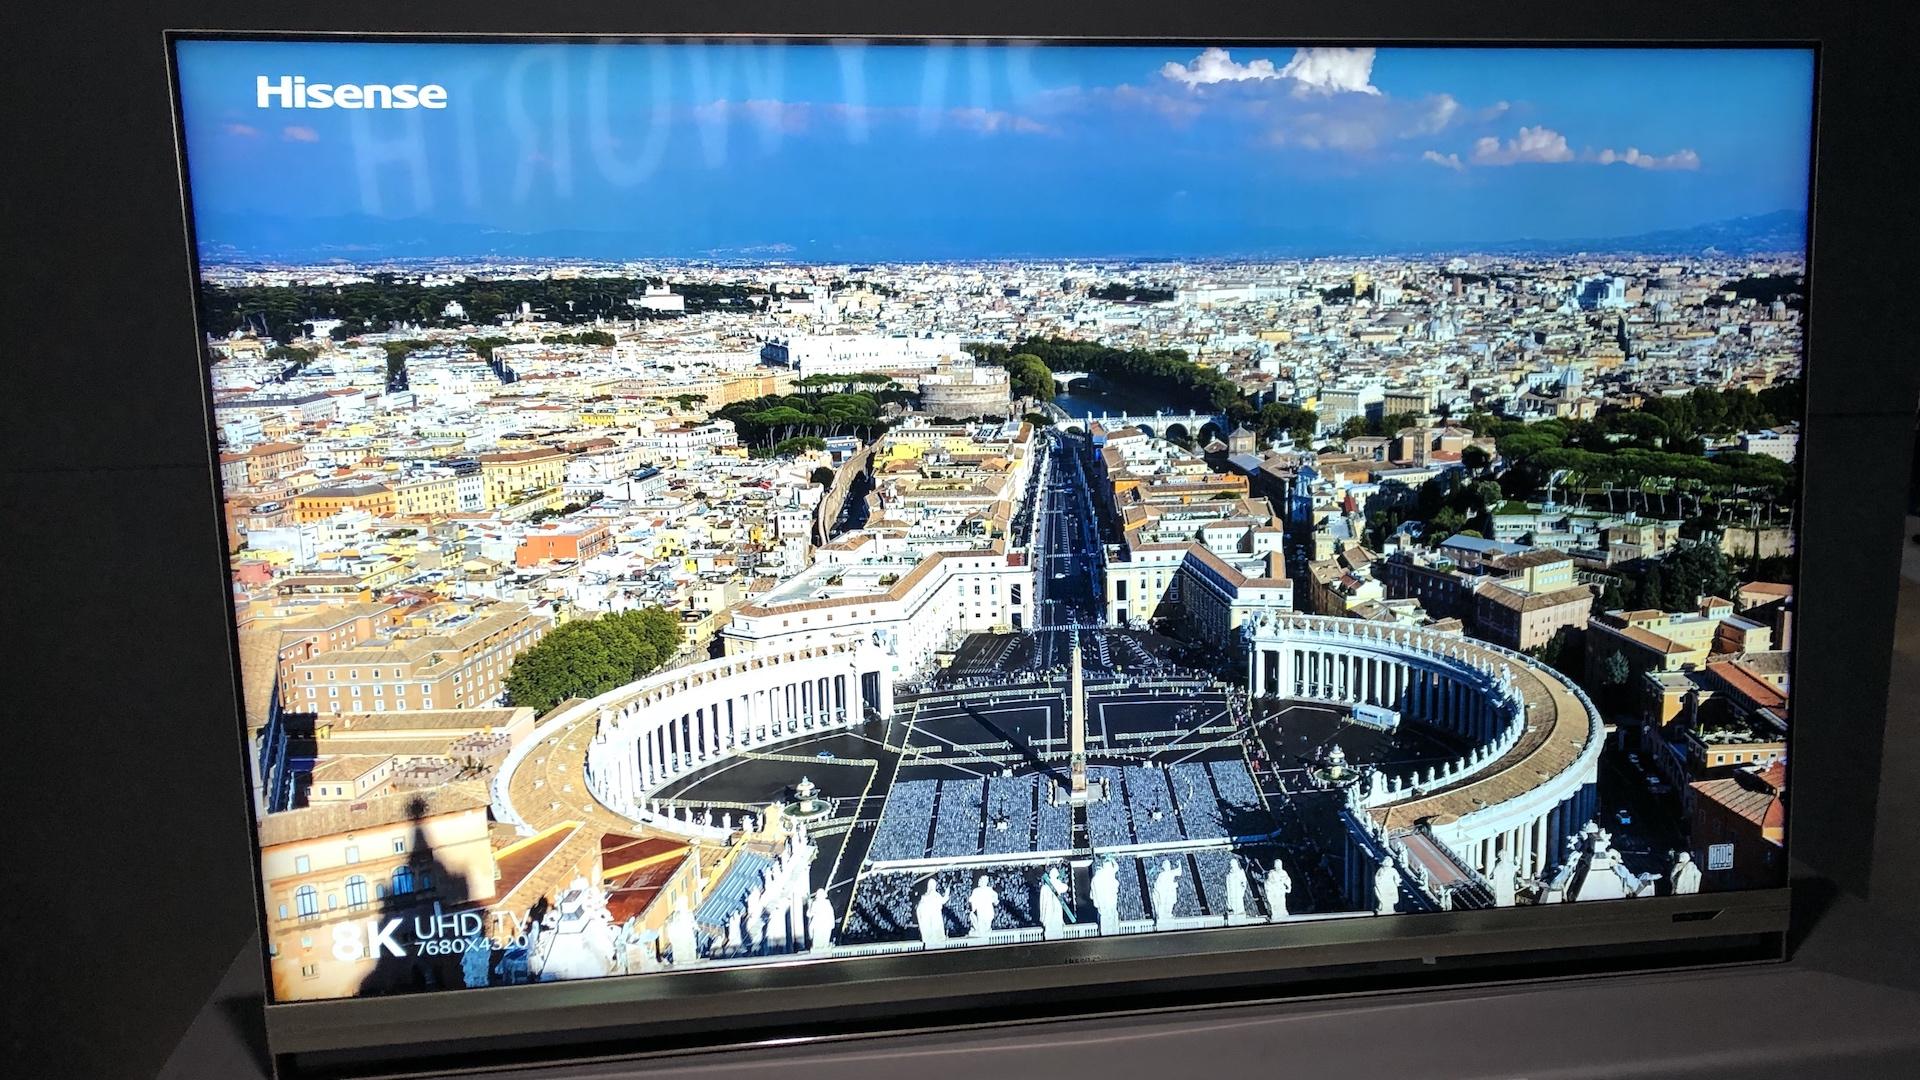 Hisense Dual Cell ULED HZ65U9E TV